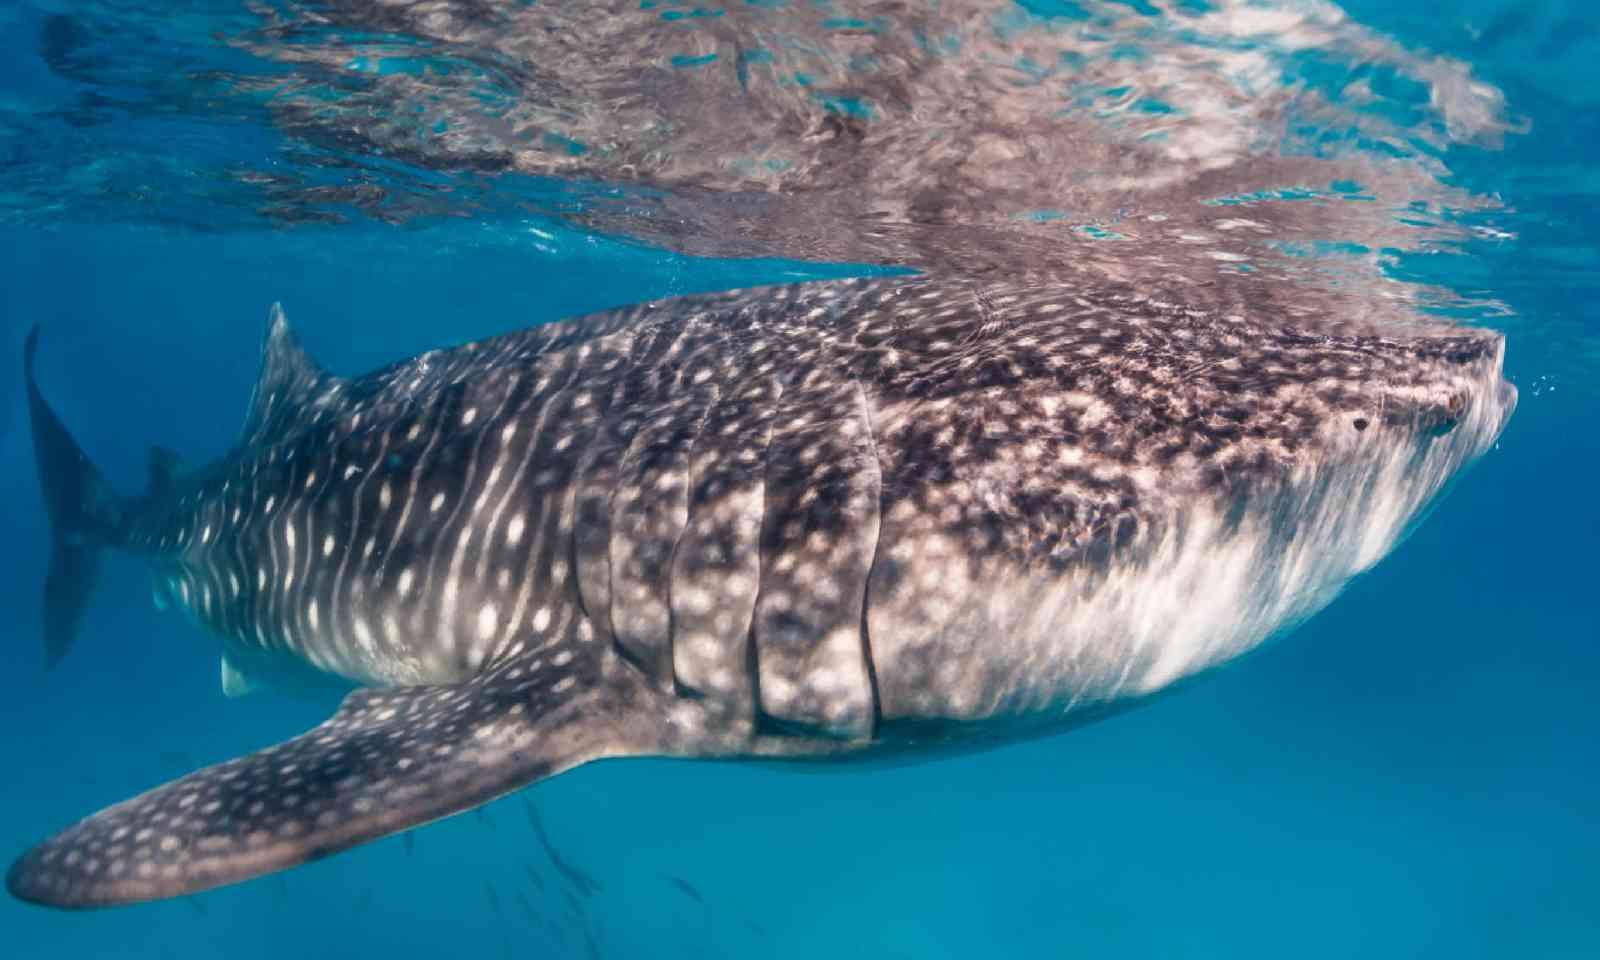 Whale shark swimming in clear water near surface (Shutterstock)